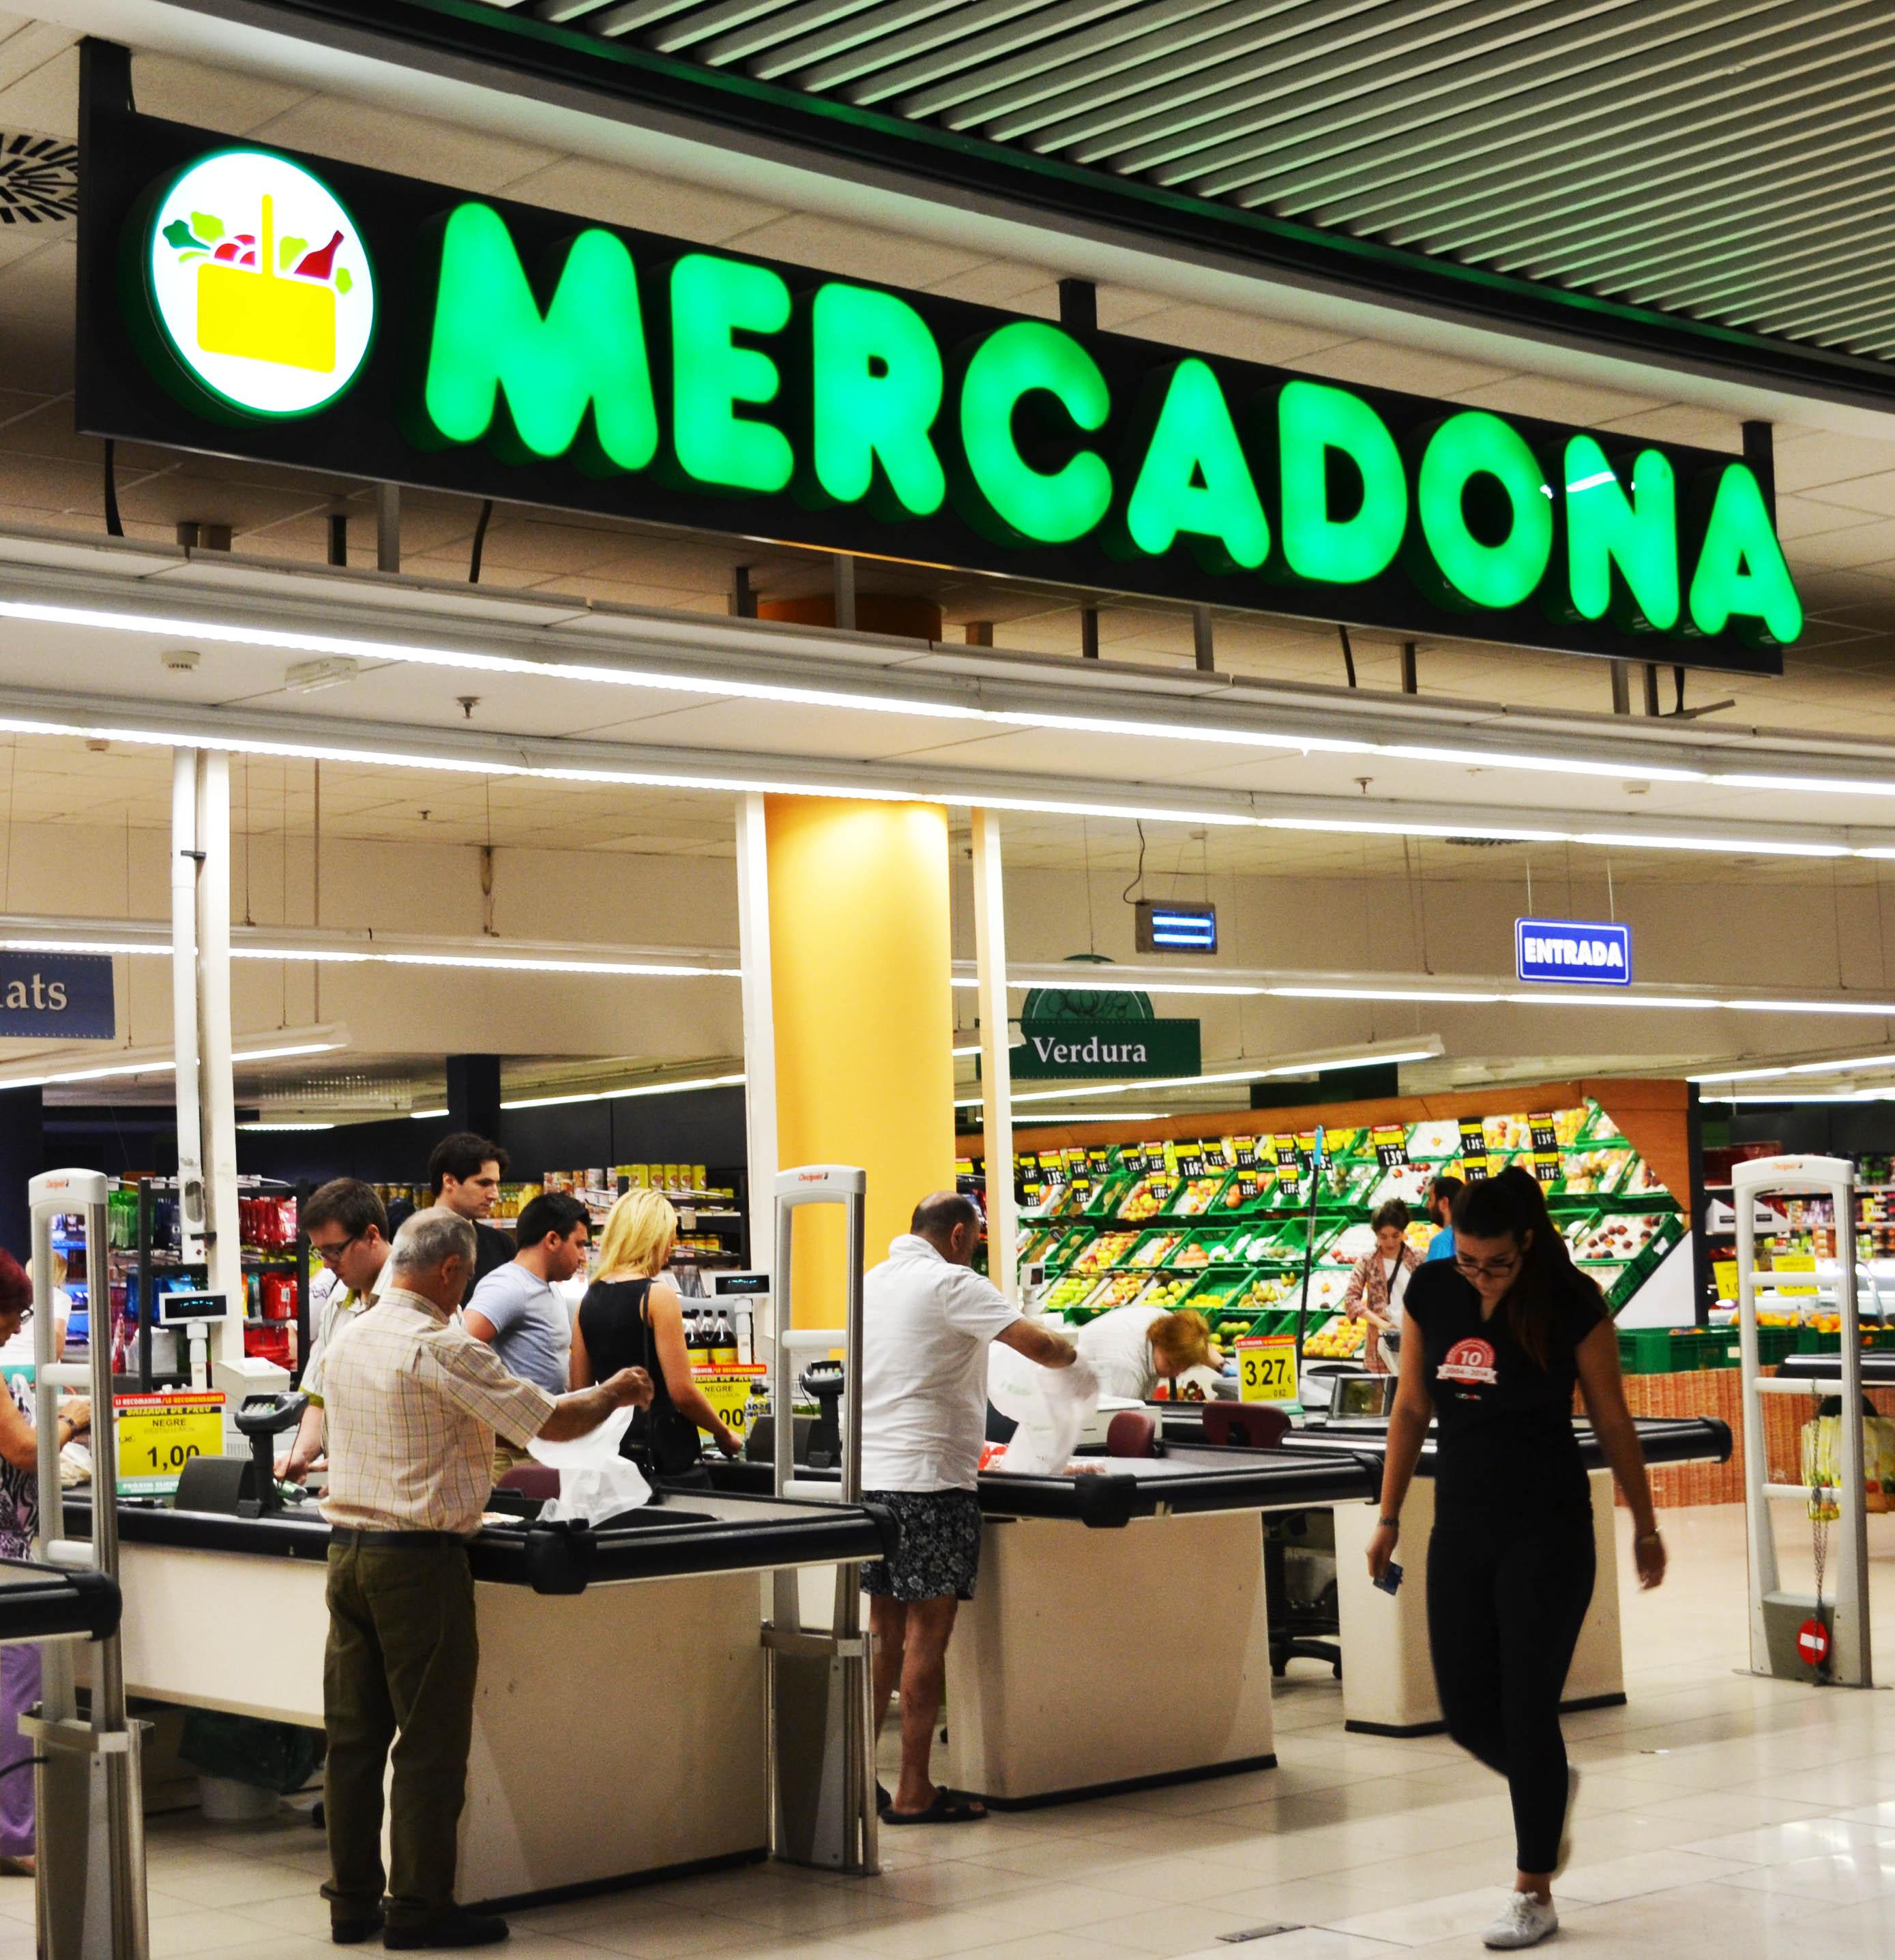 mercadona Mercadona - download as powerpoint presentation (ppt), pdf file (pdf), text file (txt) or view presentation slides online.